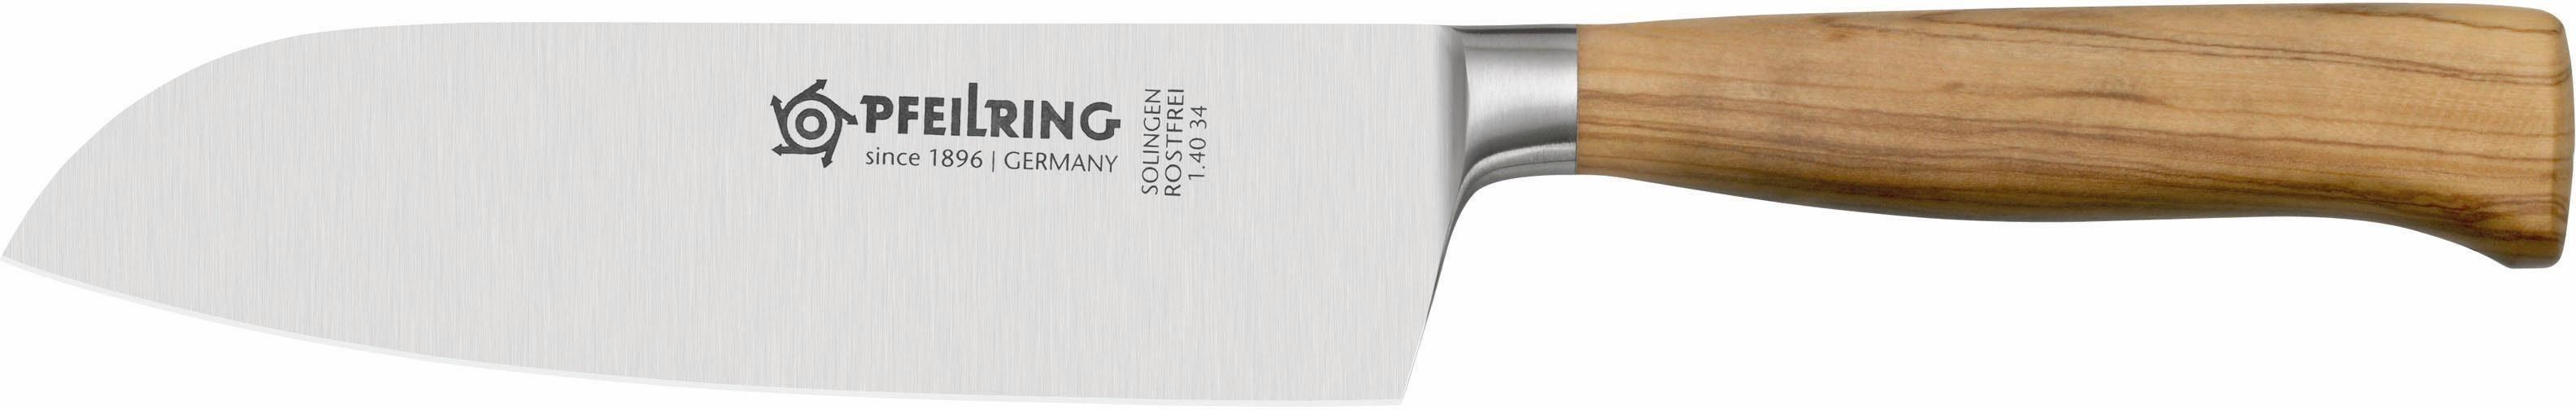 PFEILRING Santokumesser, rostfrei, Made in Germany, 16 cm, »OLIVE-LINE«